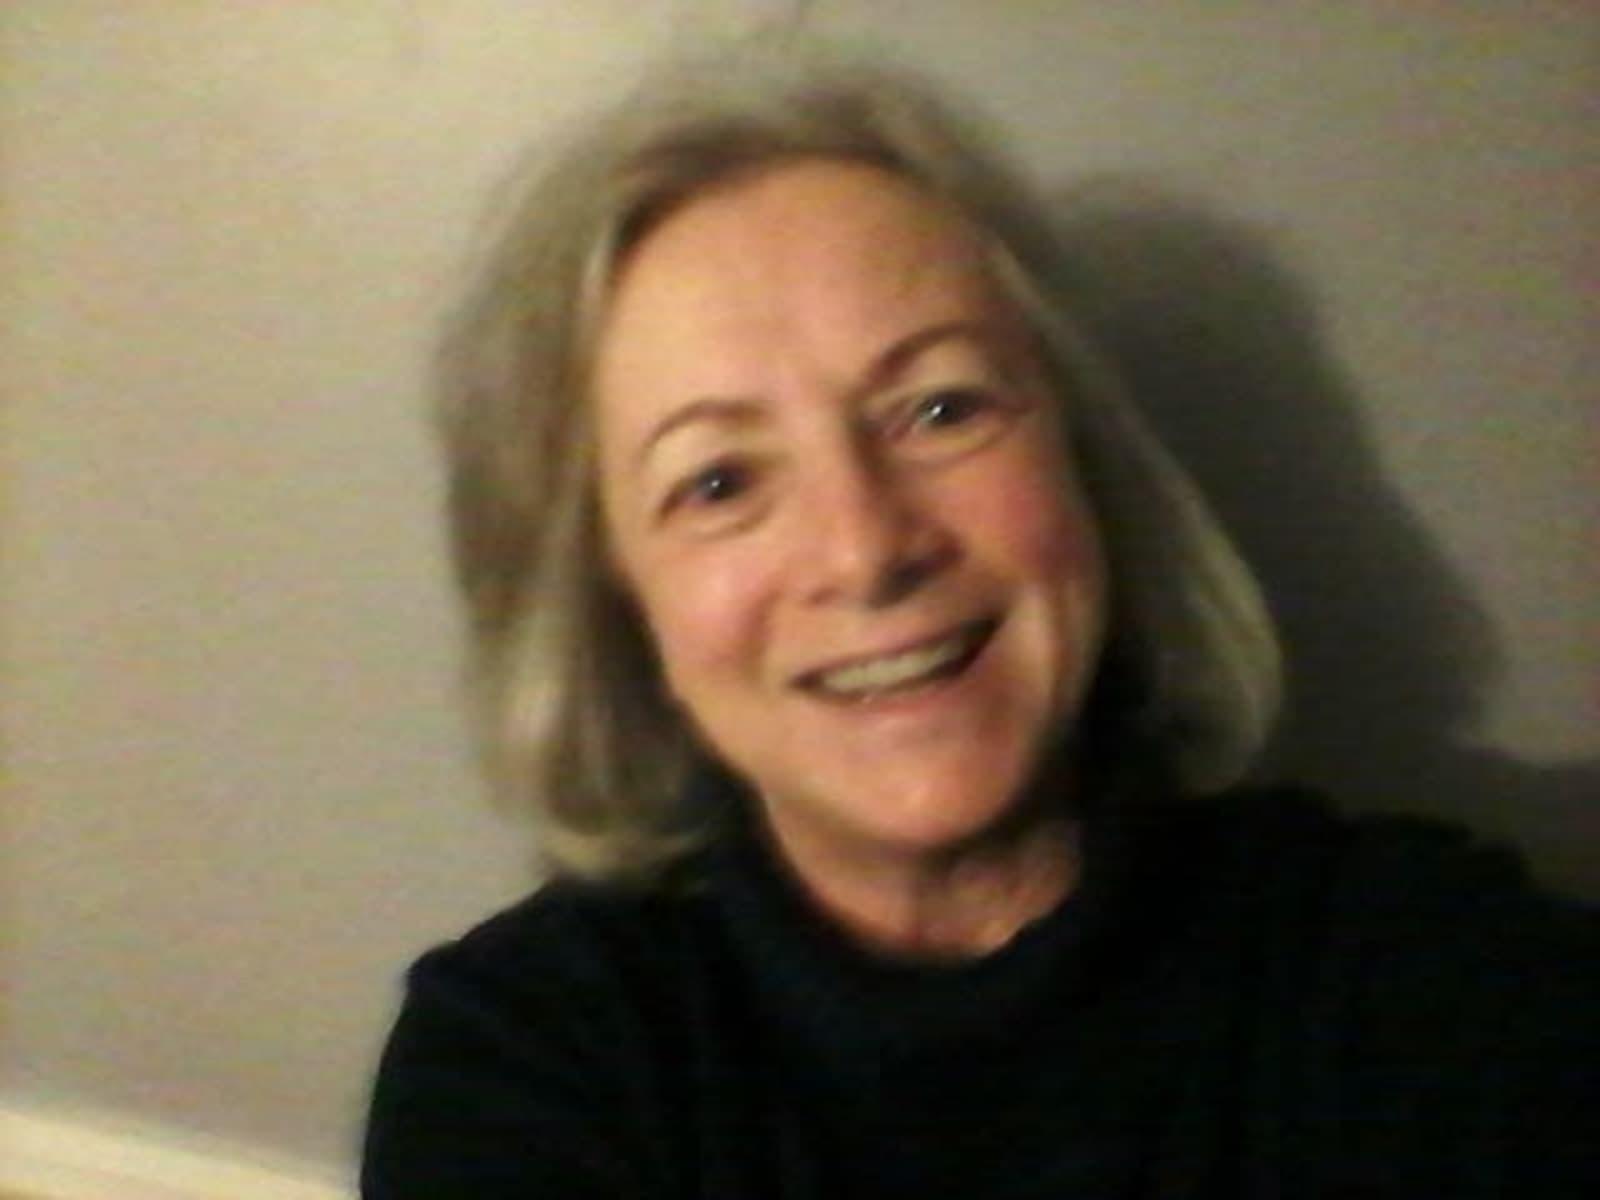 Viktoria from Portland, Maine, United States